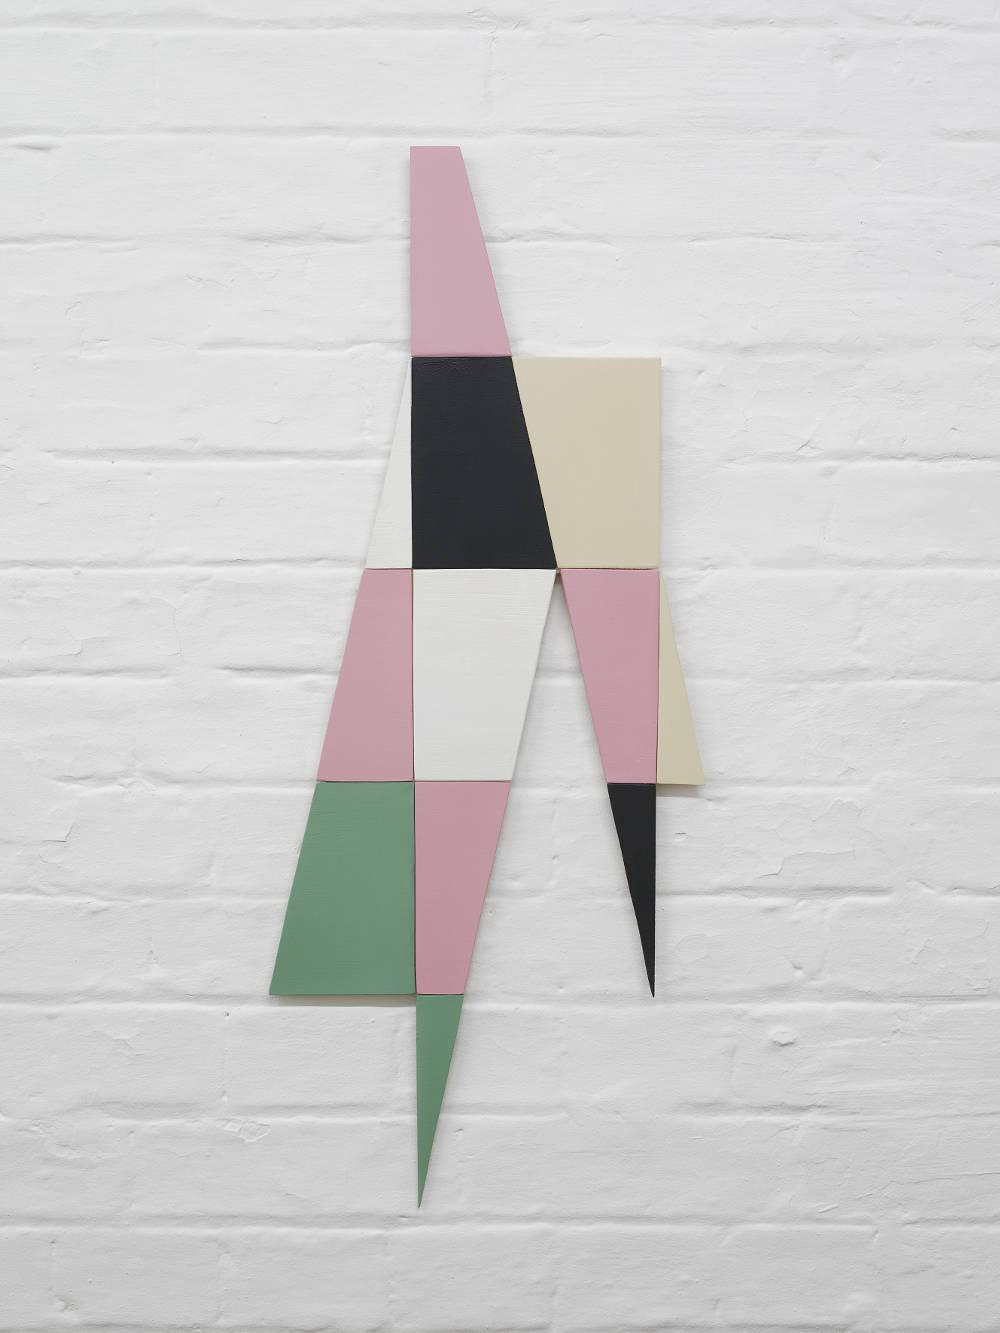 Knut Henrik Henriksen, Untitled, 2015. Paint on wood 74h x 31w x 0.50d cm. Courtesy the artist and Hollybush Gardens, London. Photo: Andy Keate